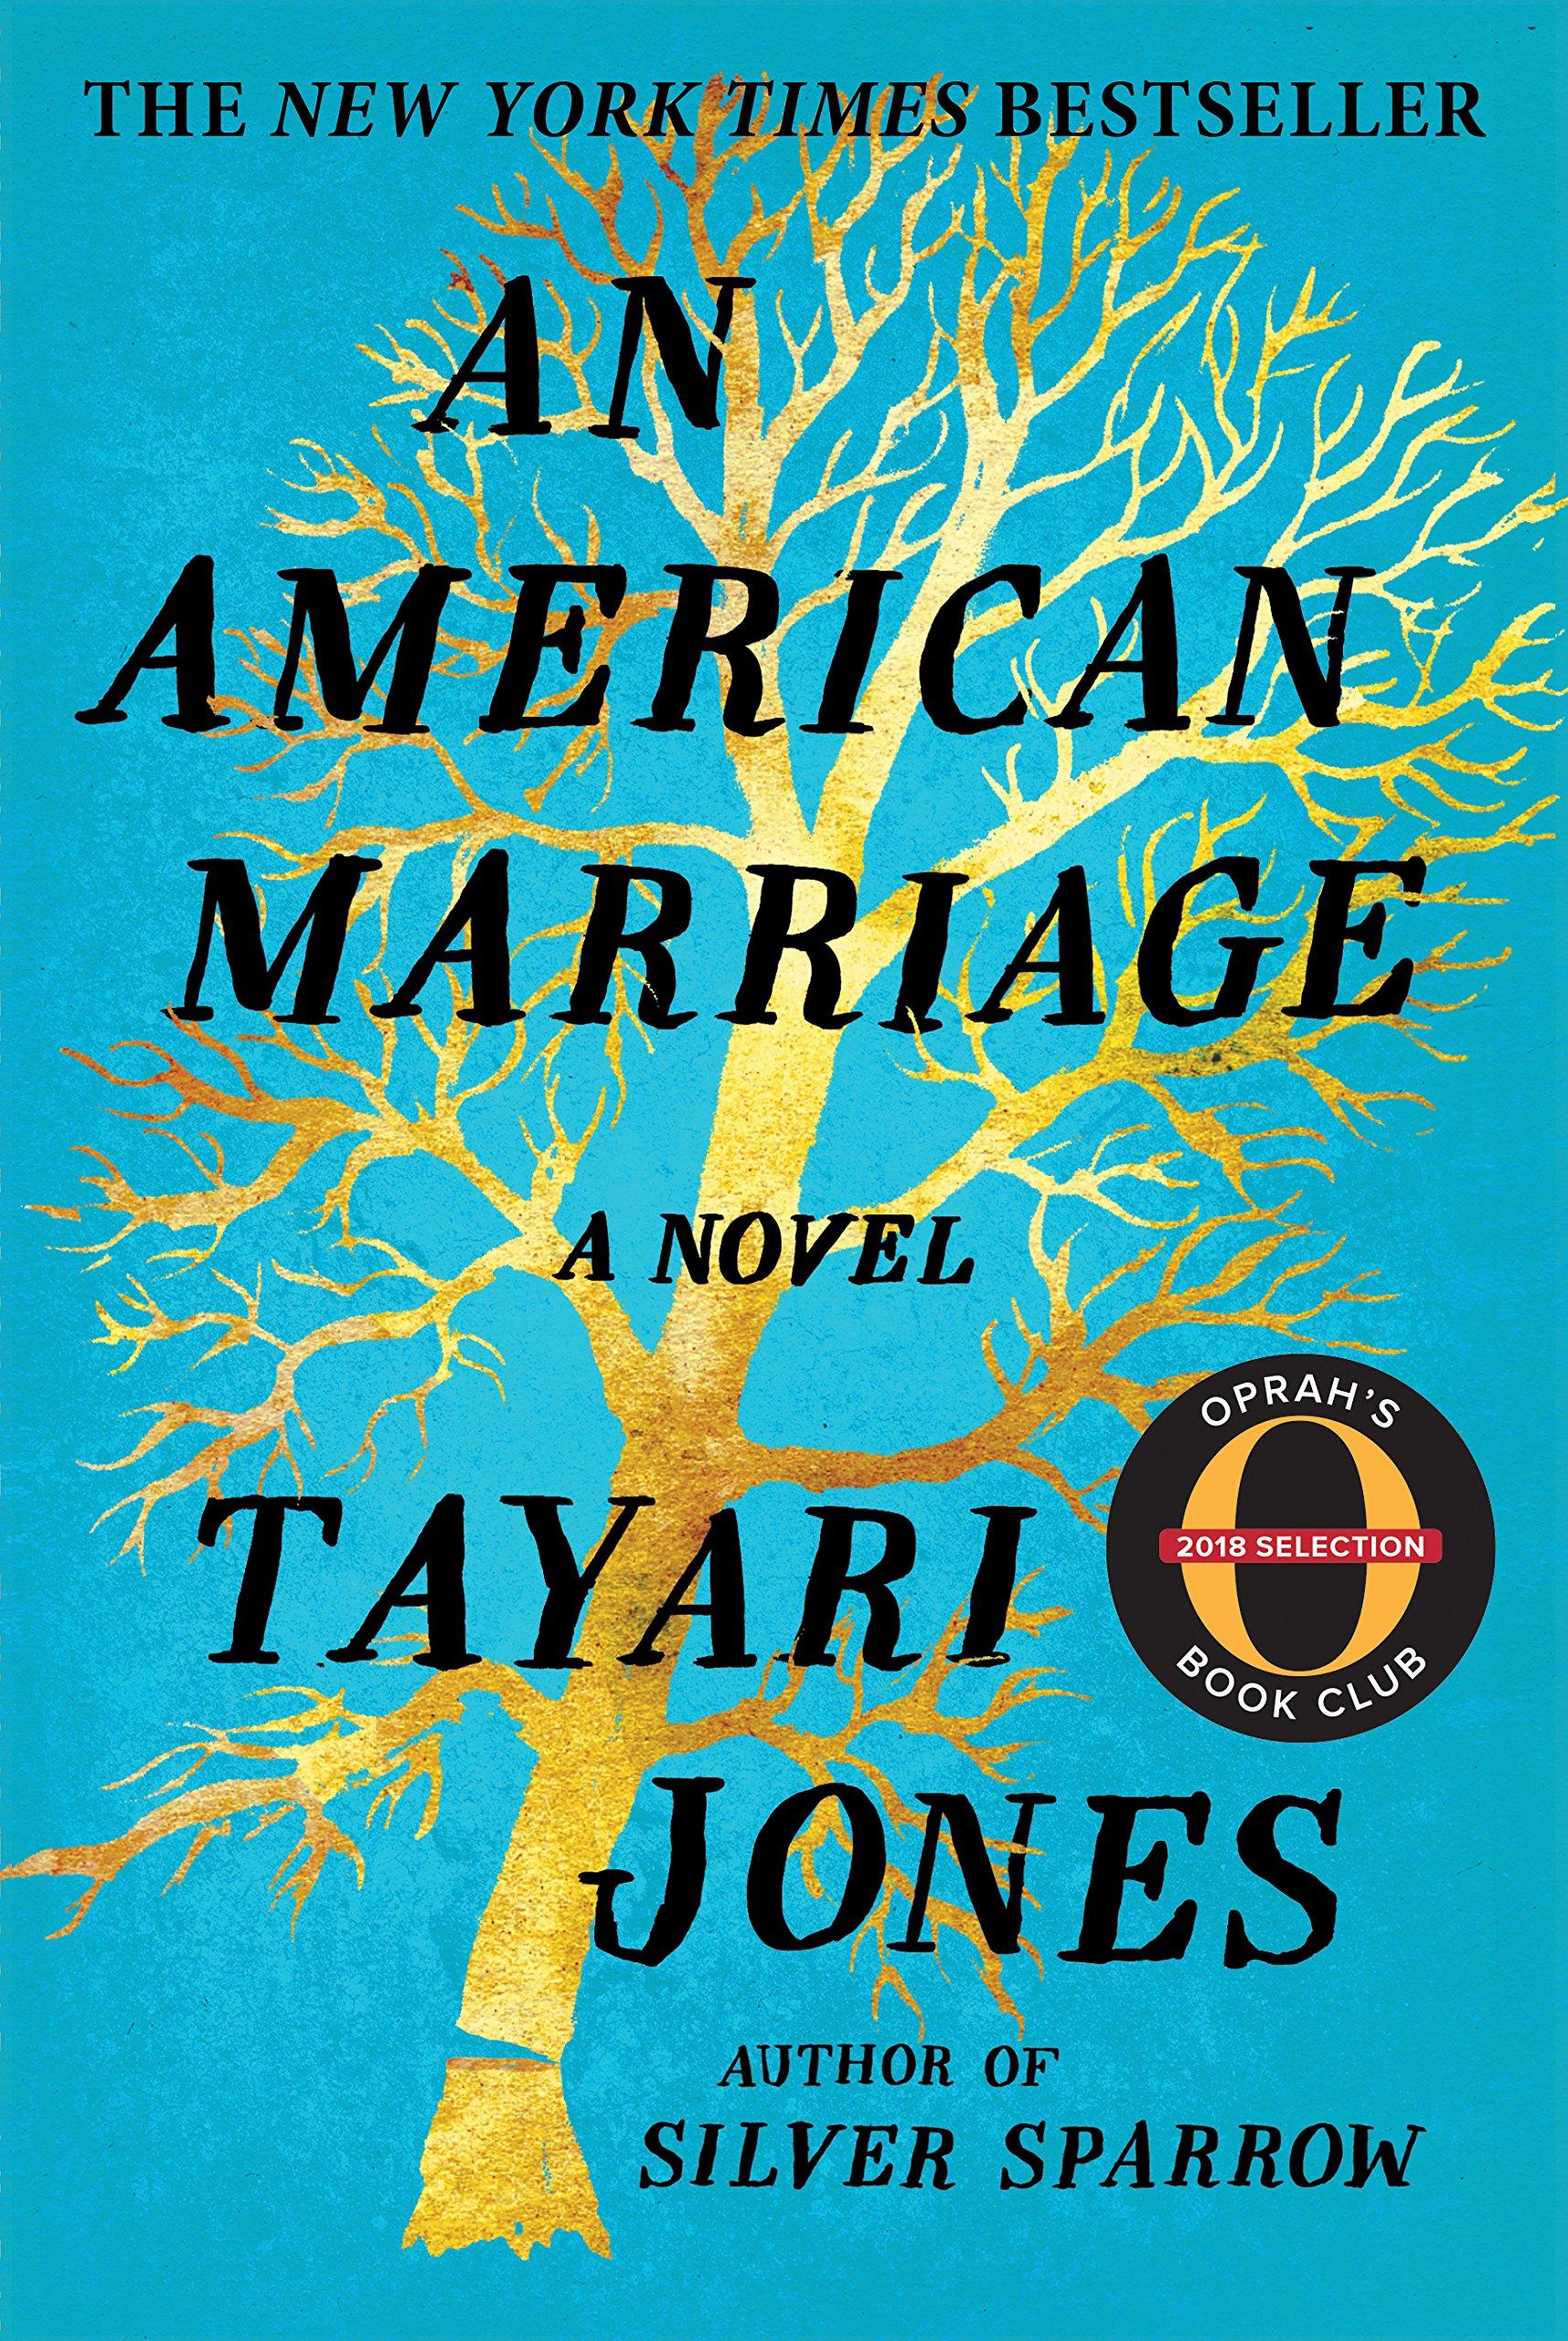 An American Marriage: A Novel: Jones, Tayari: 9781616201340: Amazon.com:  Books